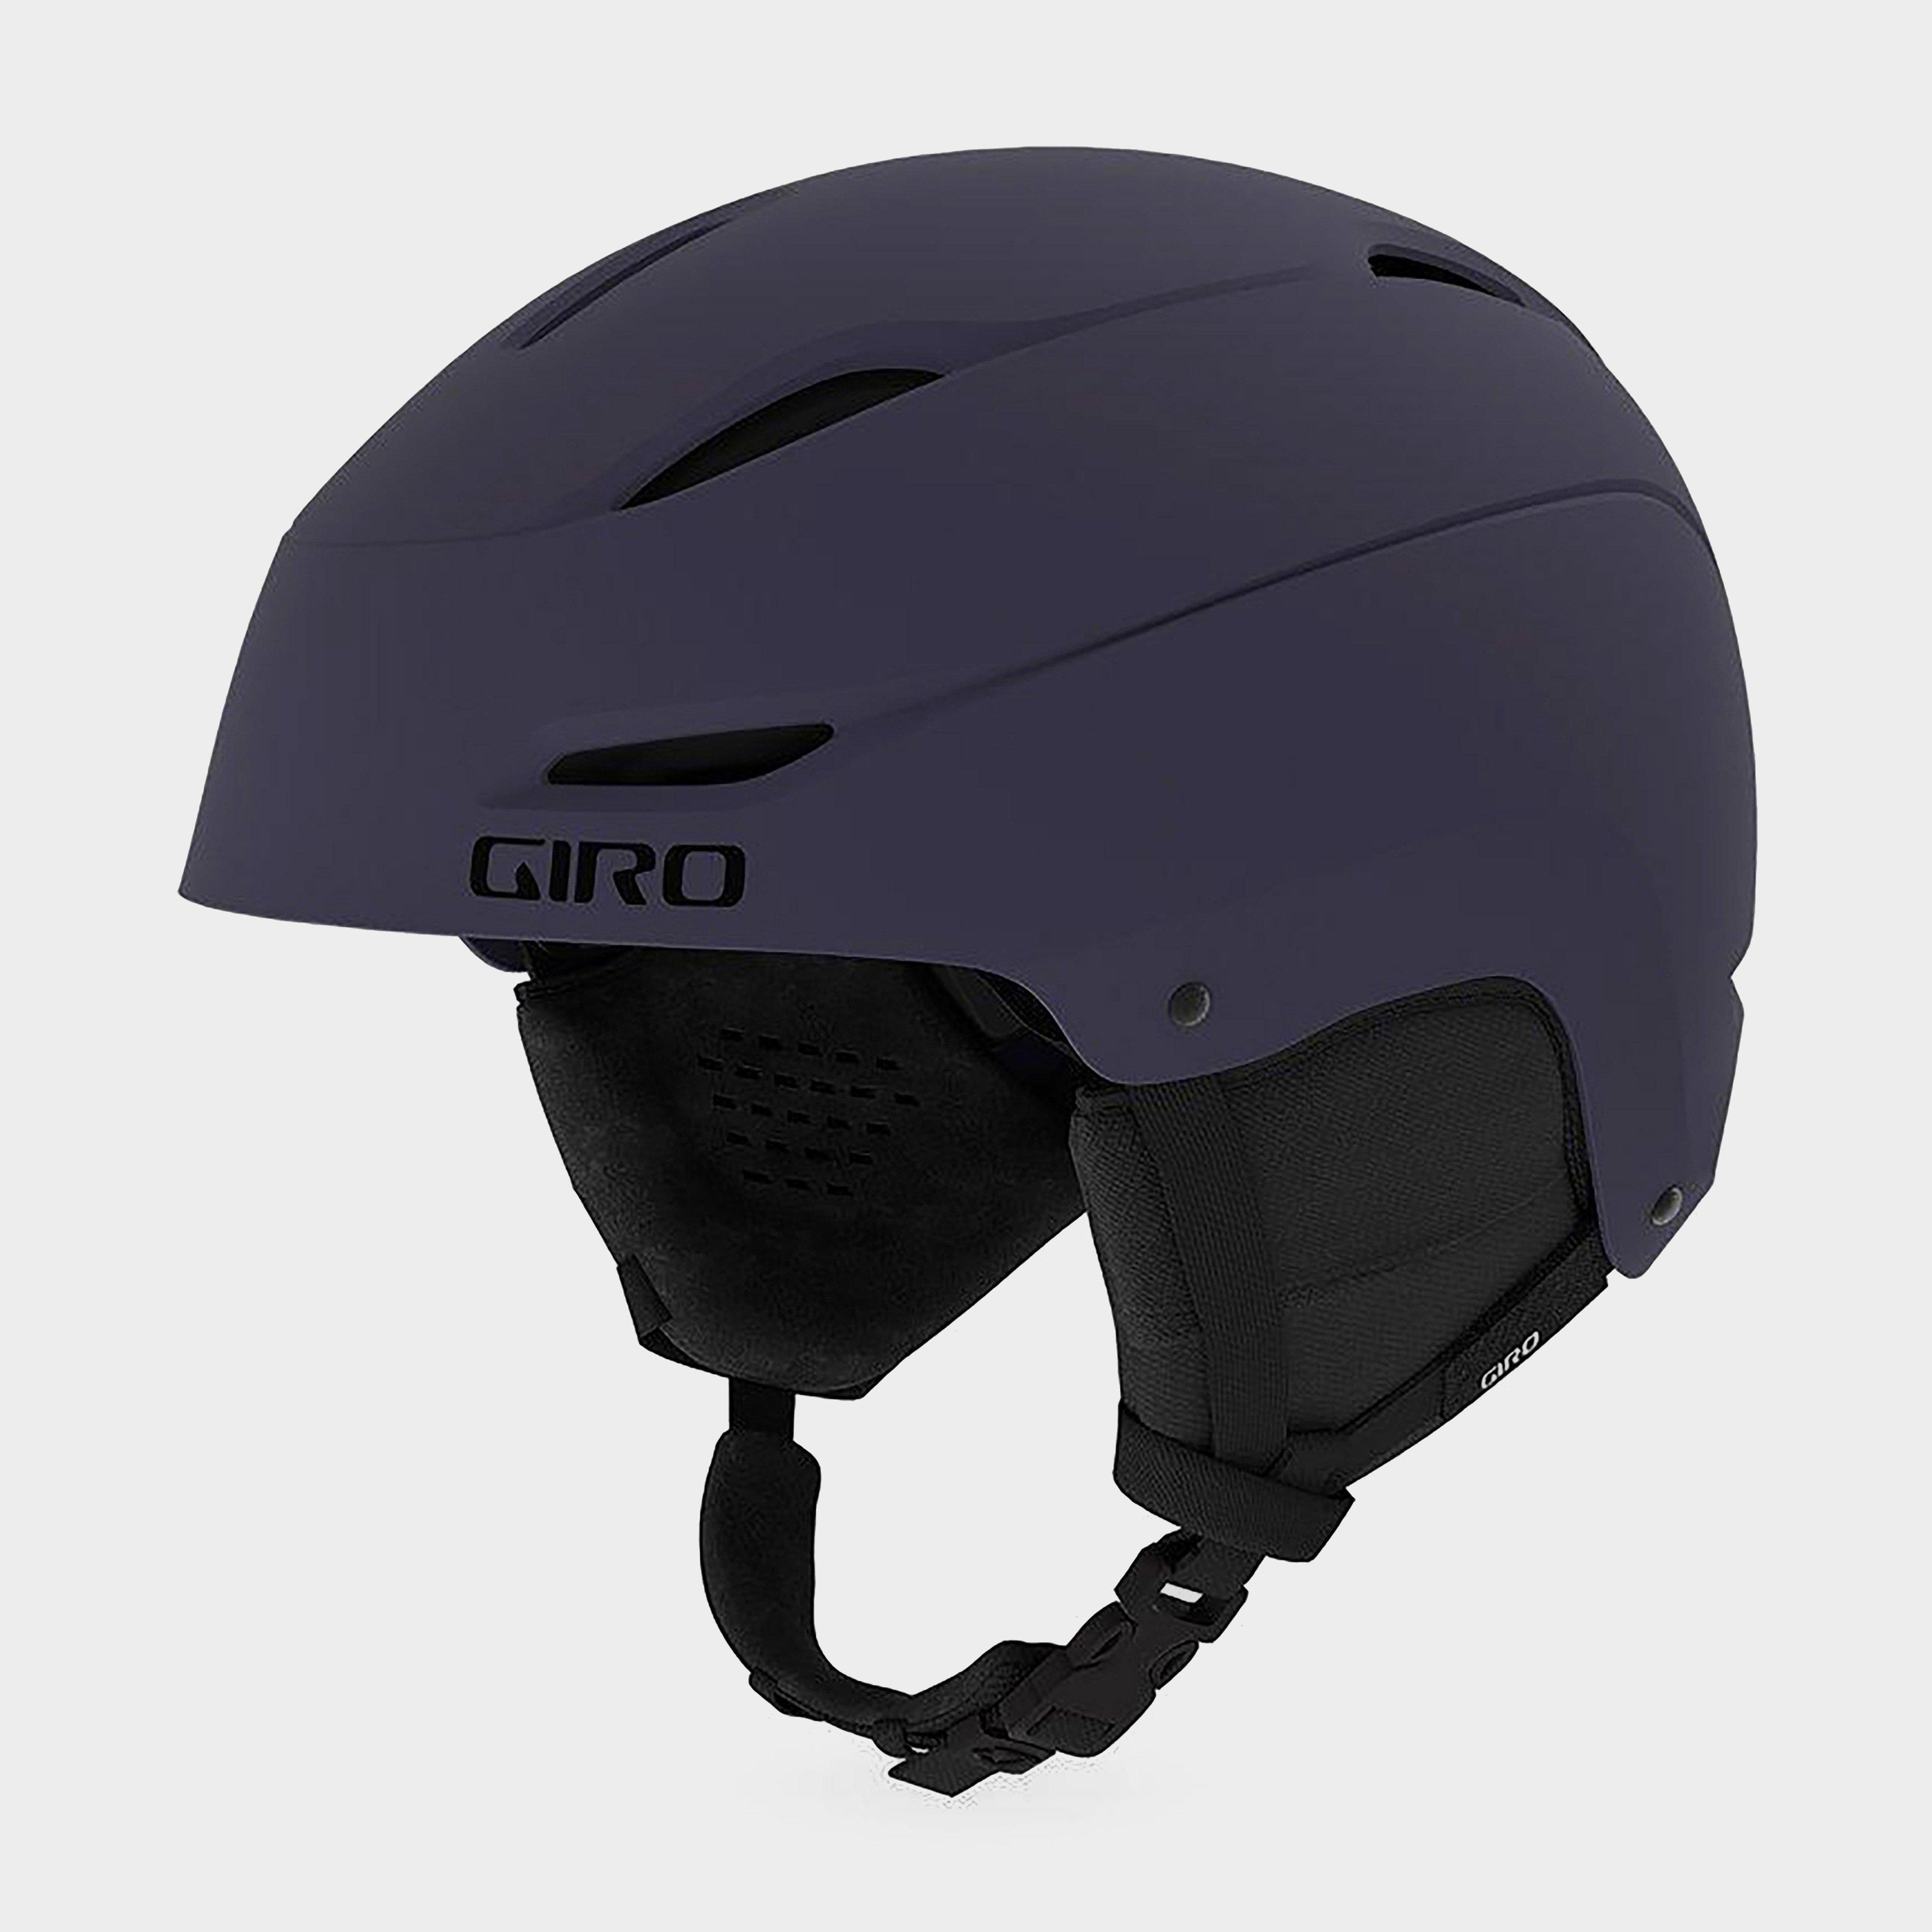 Giro Ratio Snow Helmet - Navy/Nvy, Navy